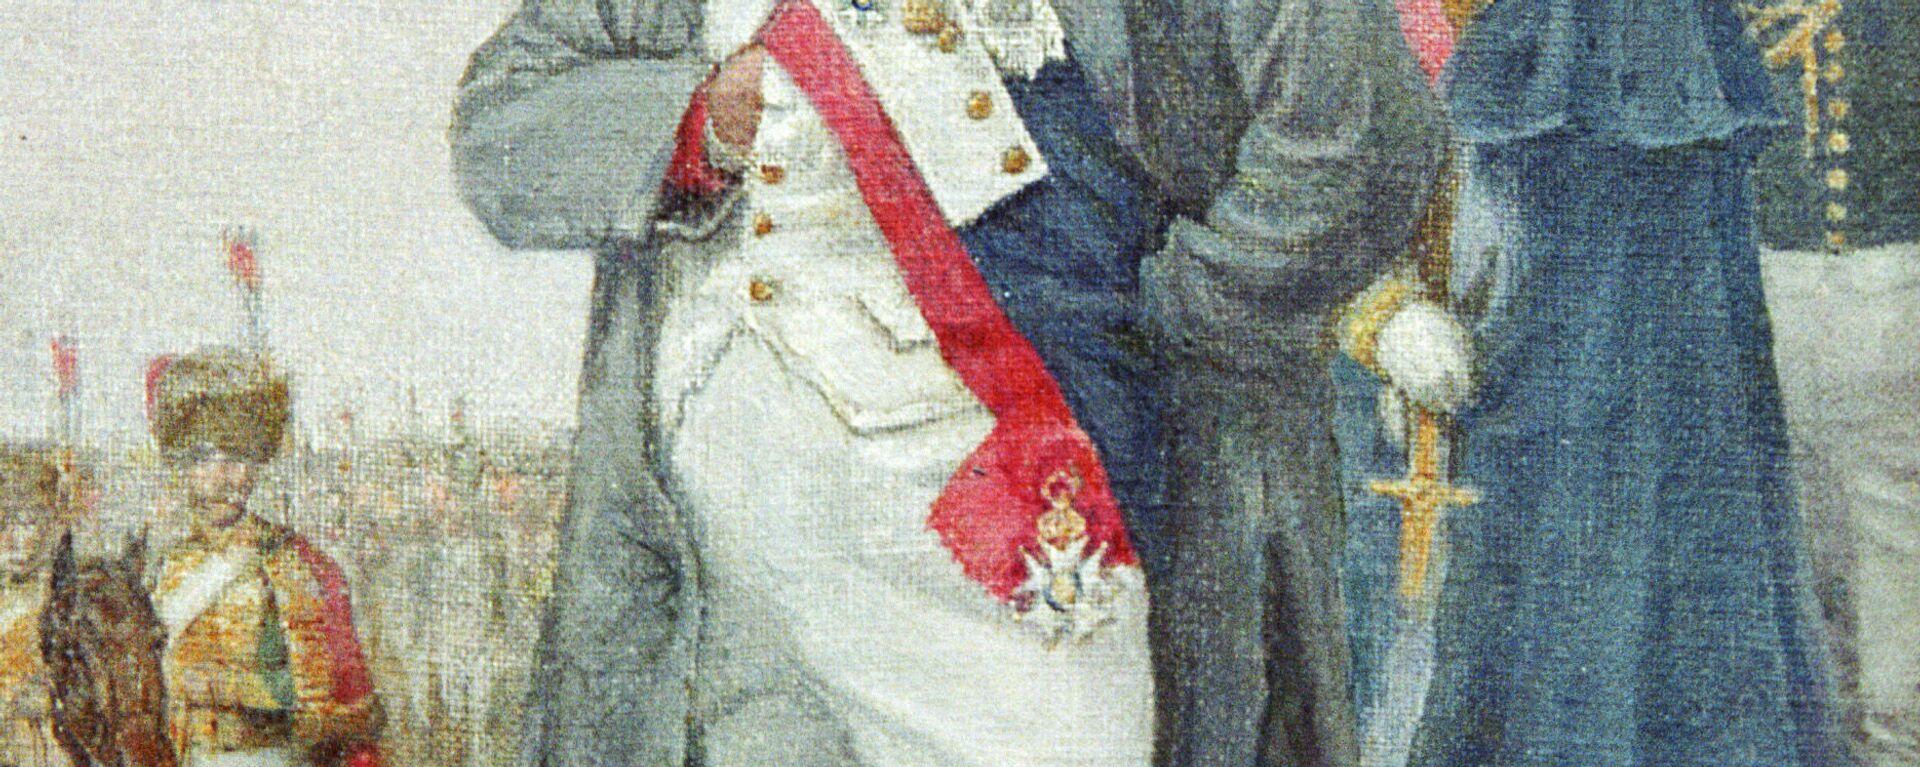 Napoleone Bonaparte - Sputnik Italia, 1920, 07.09.2021